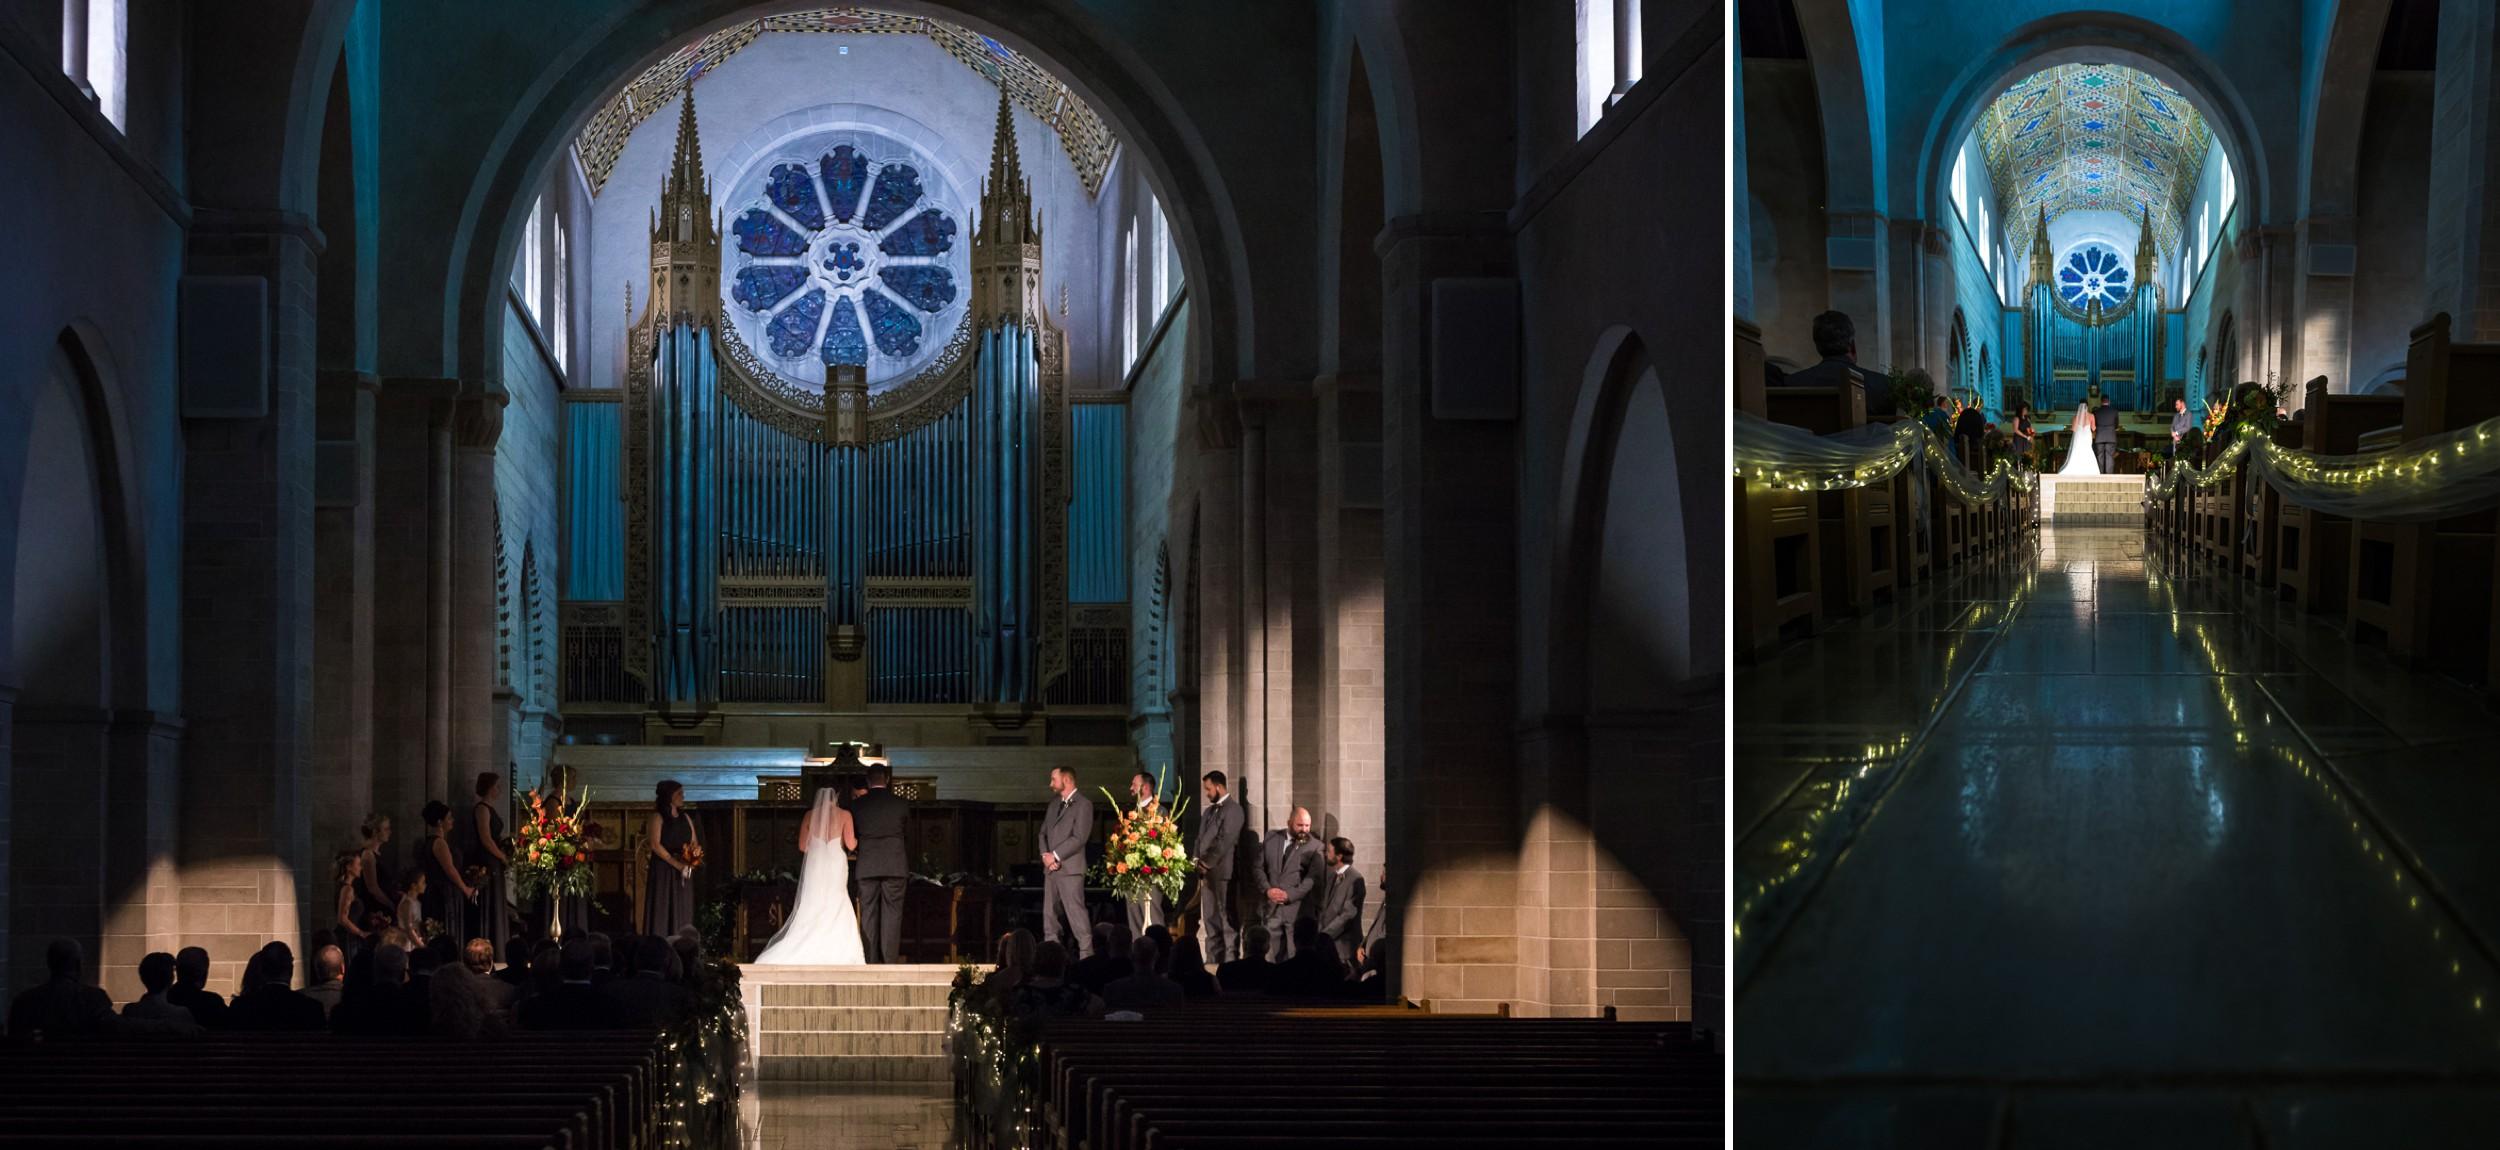 Criddle Wedding 6.jpg